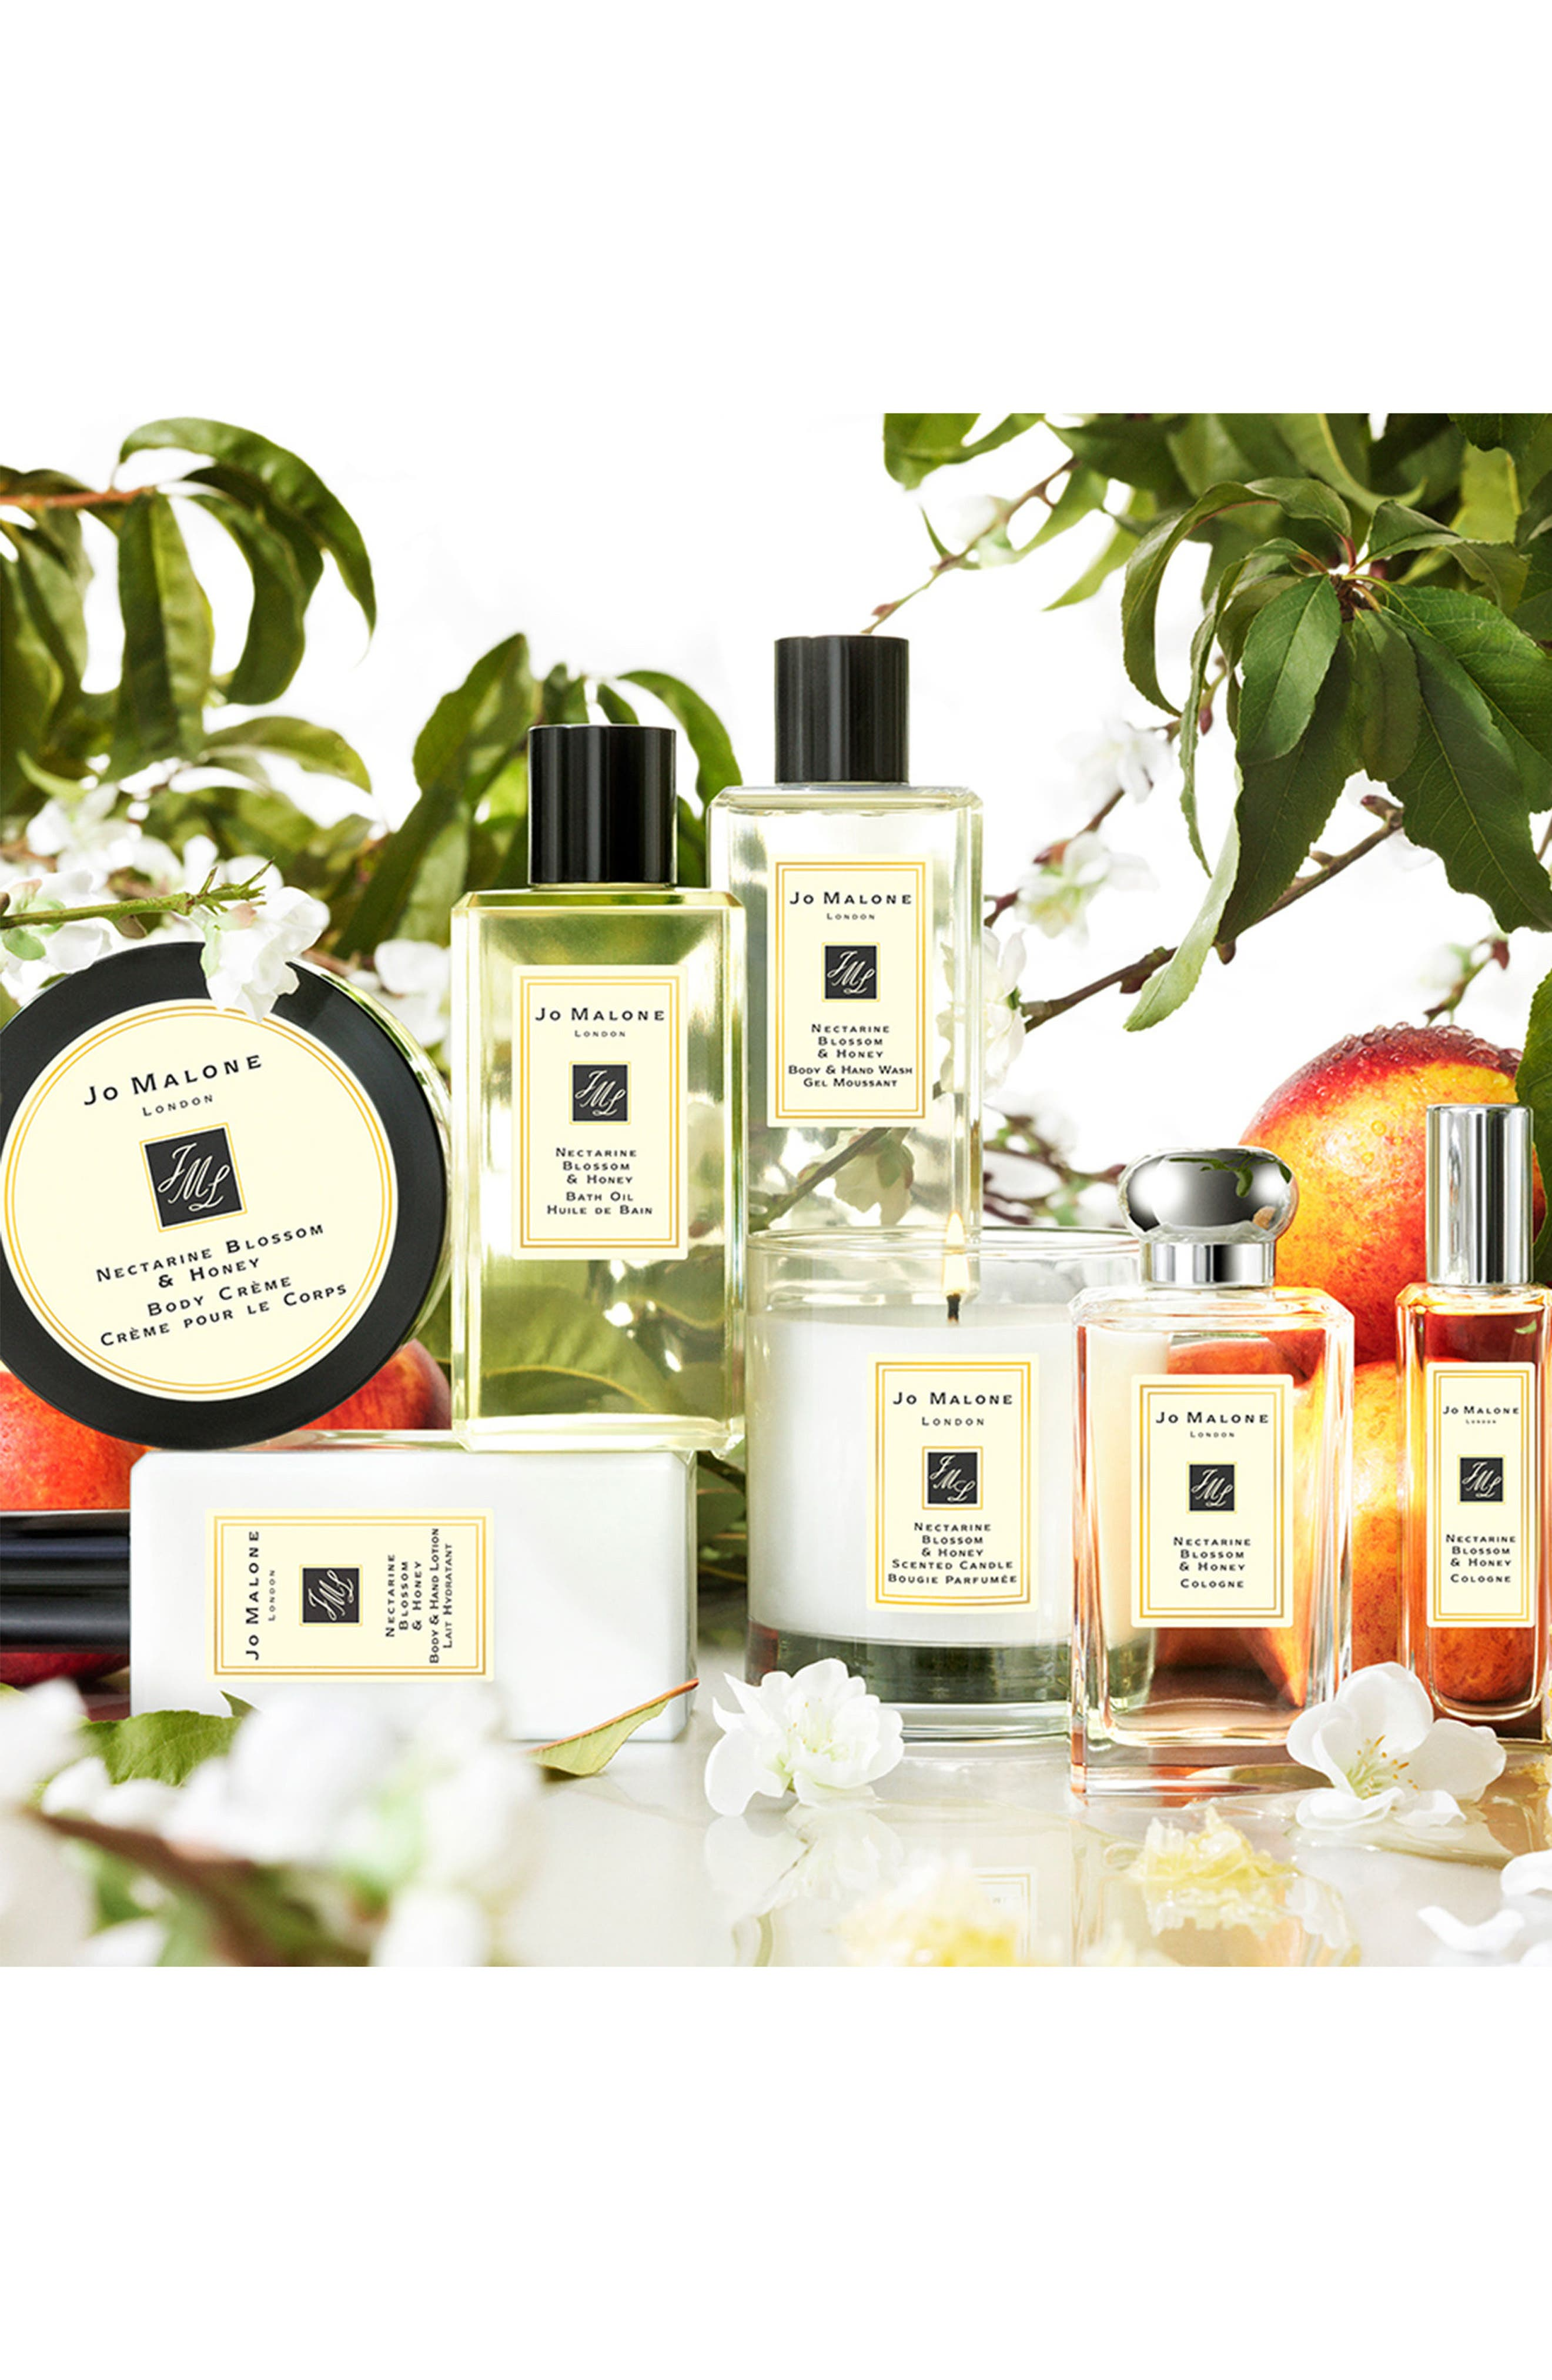 Alternate Image 3  - Jo Malone London™ 'Nectarine Blossom & Honey' Body & Hand Lotion